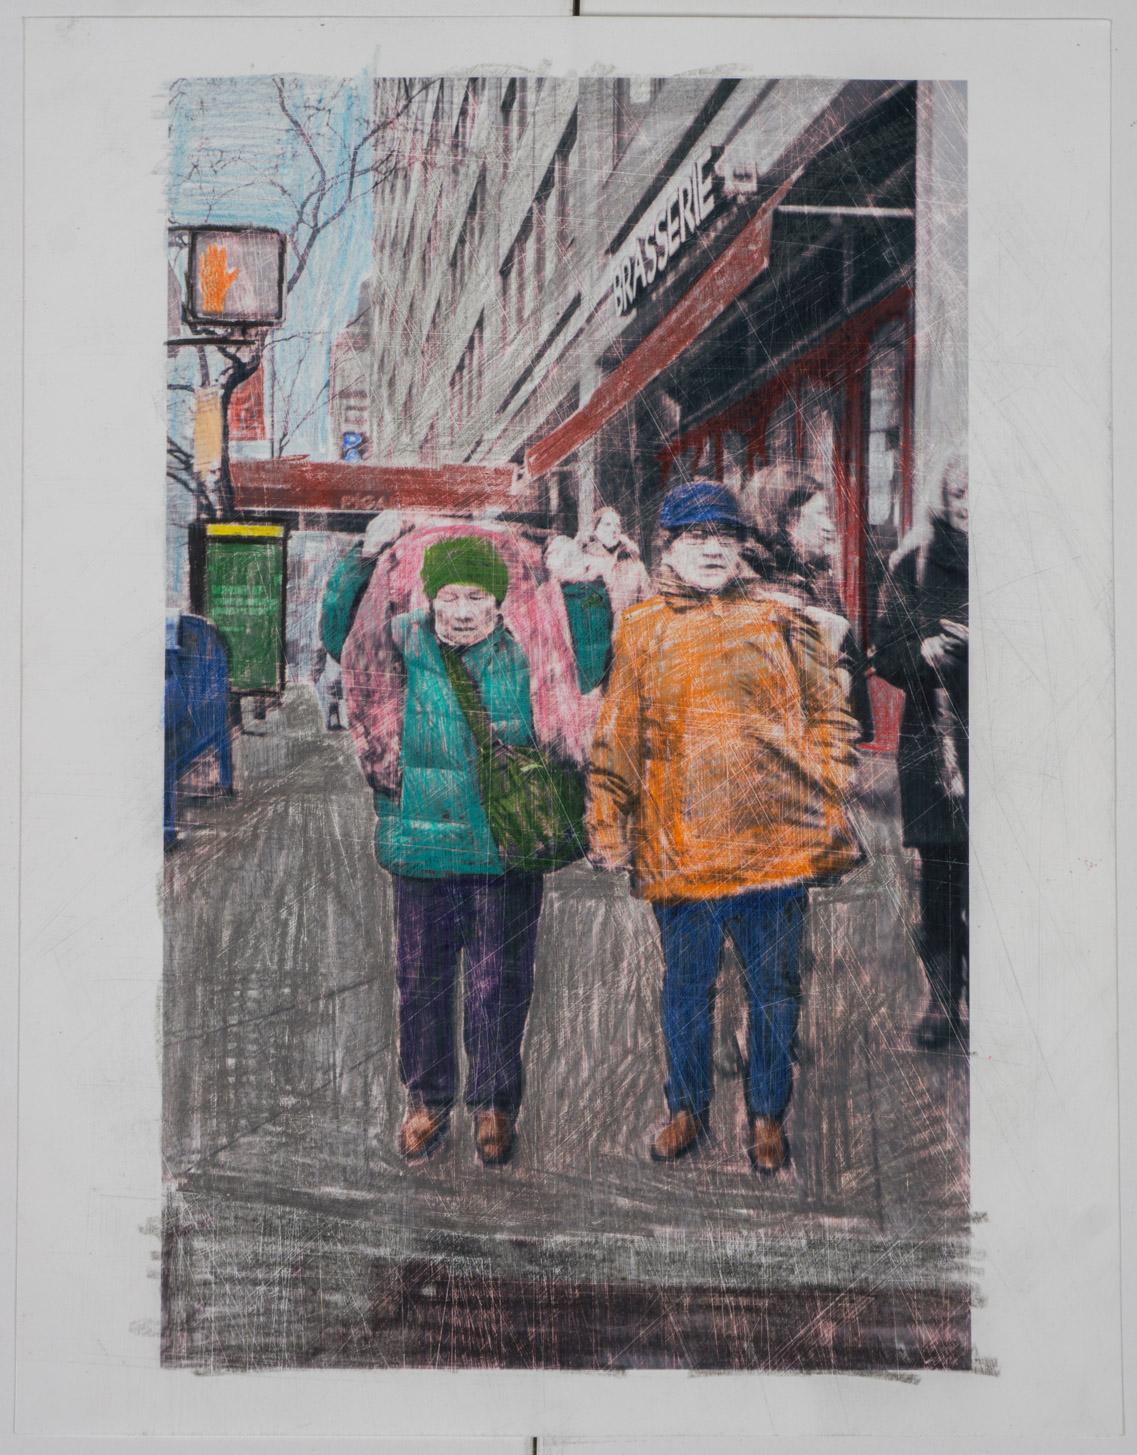 2 nyc Tourist  (8x10 - sanded print - pencil